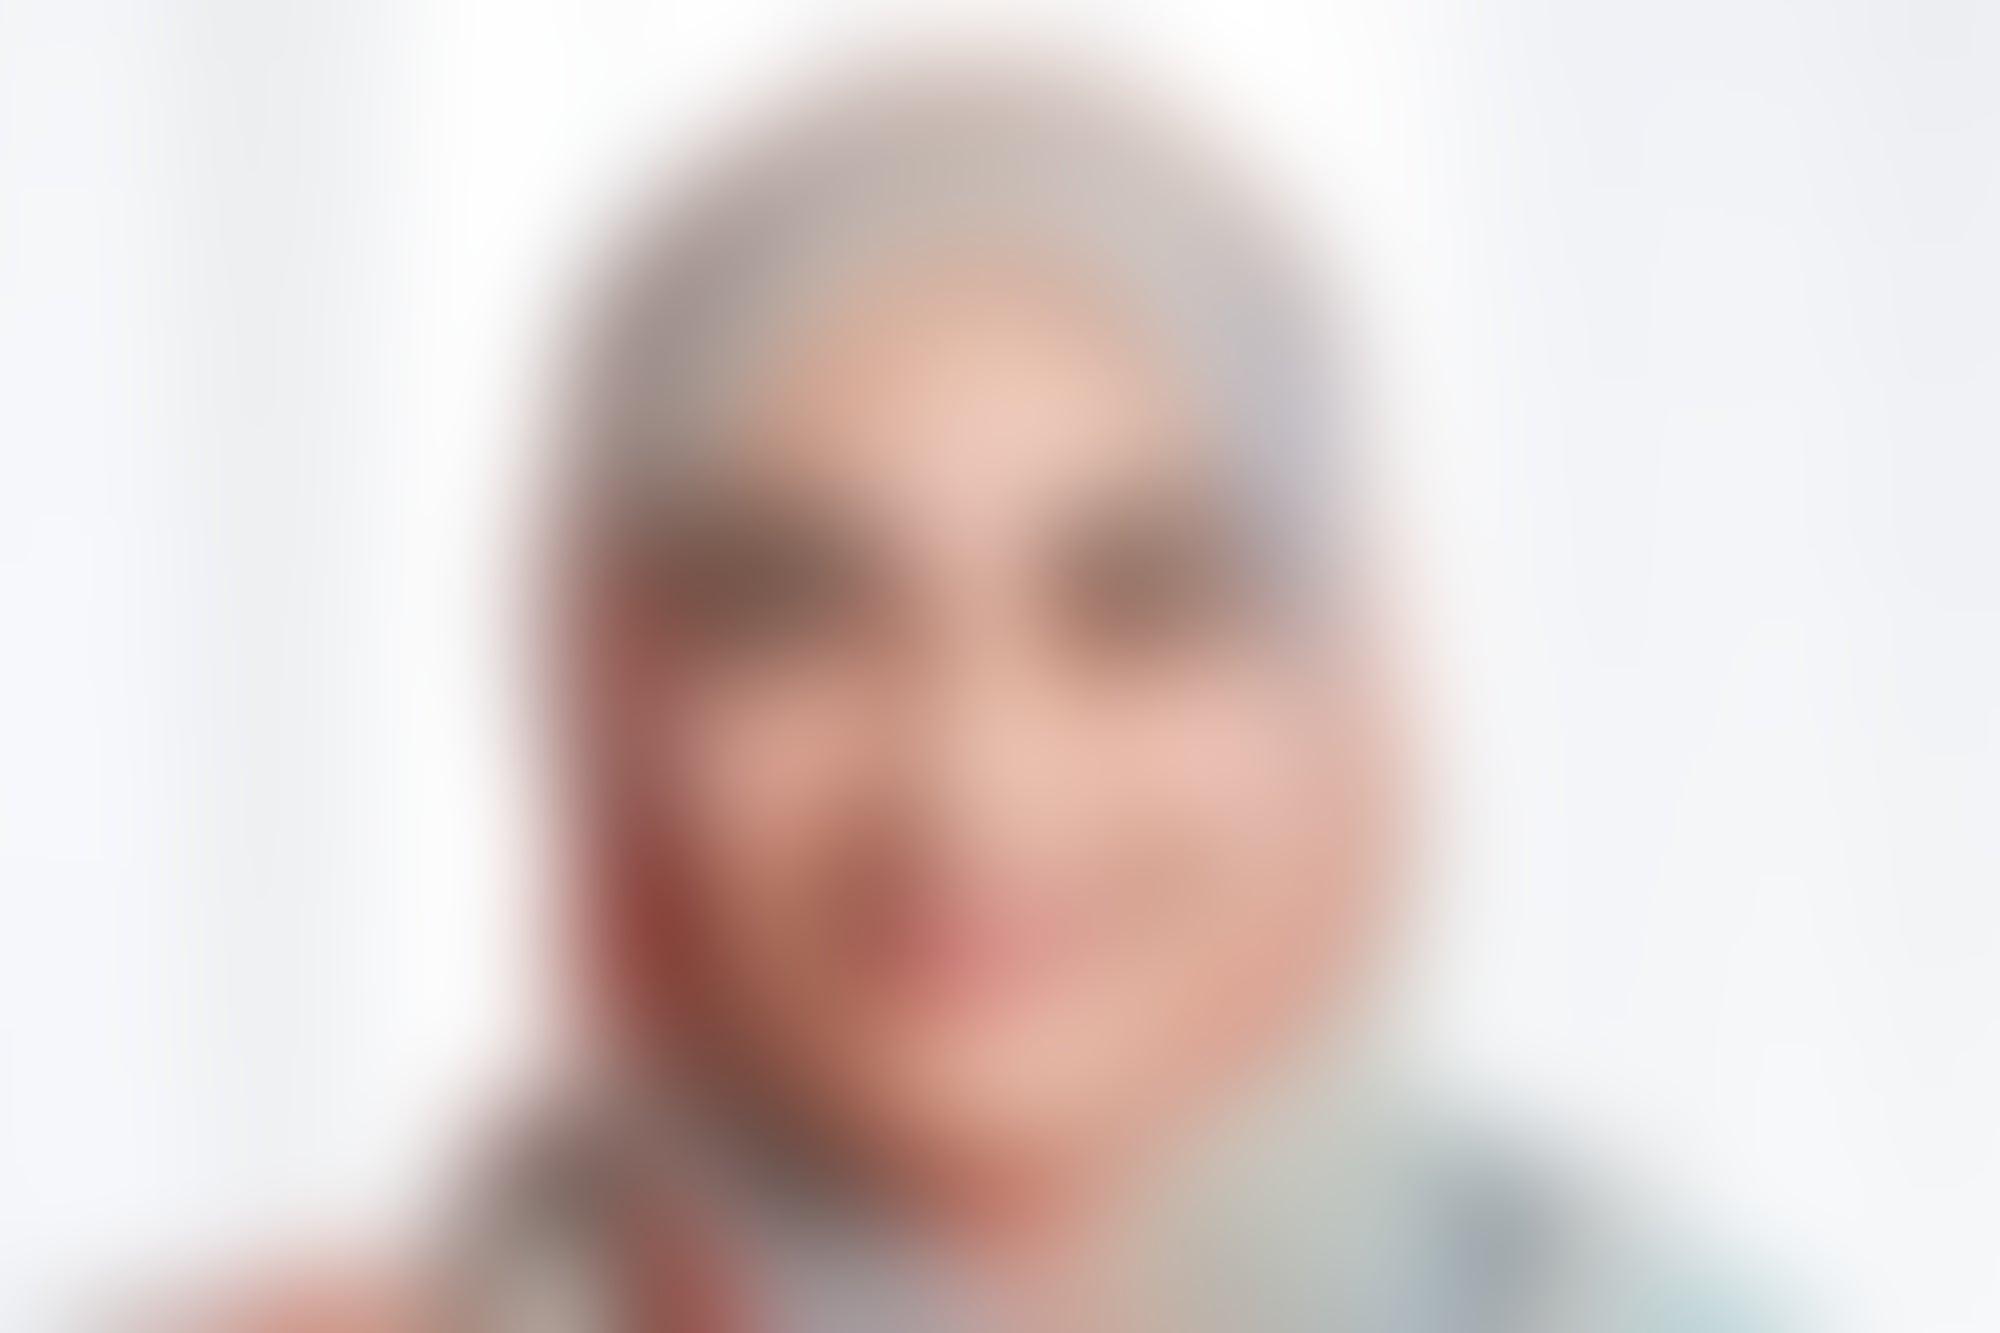 Leading The Way: Saudi Arabia's Dr. Hayat Sindi